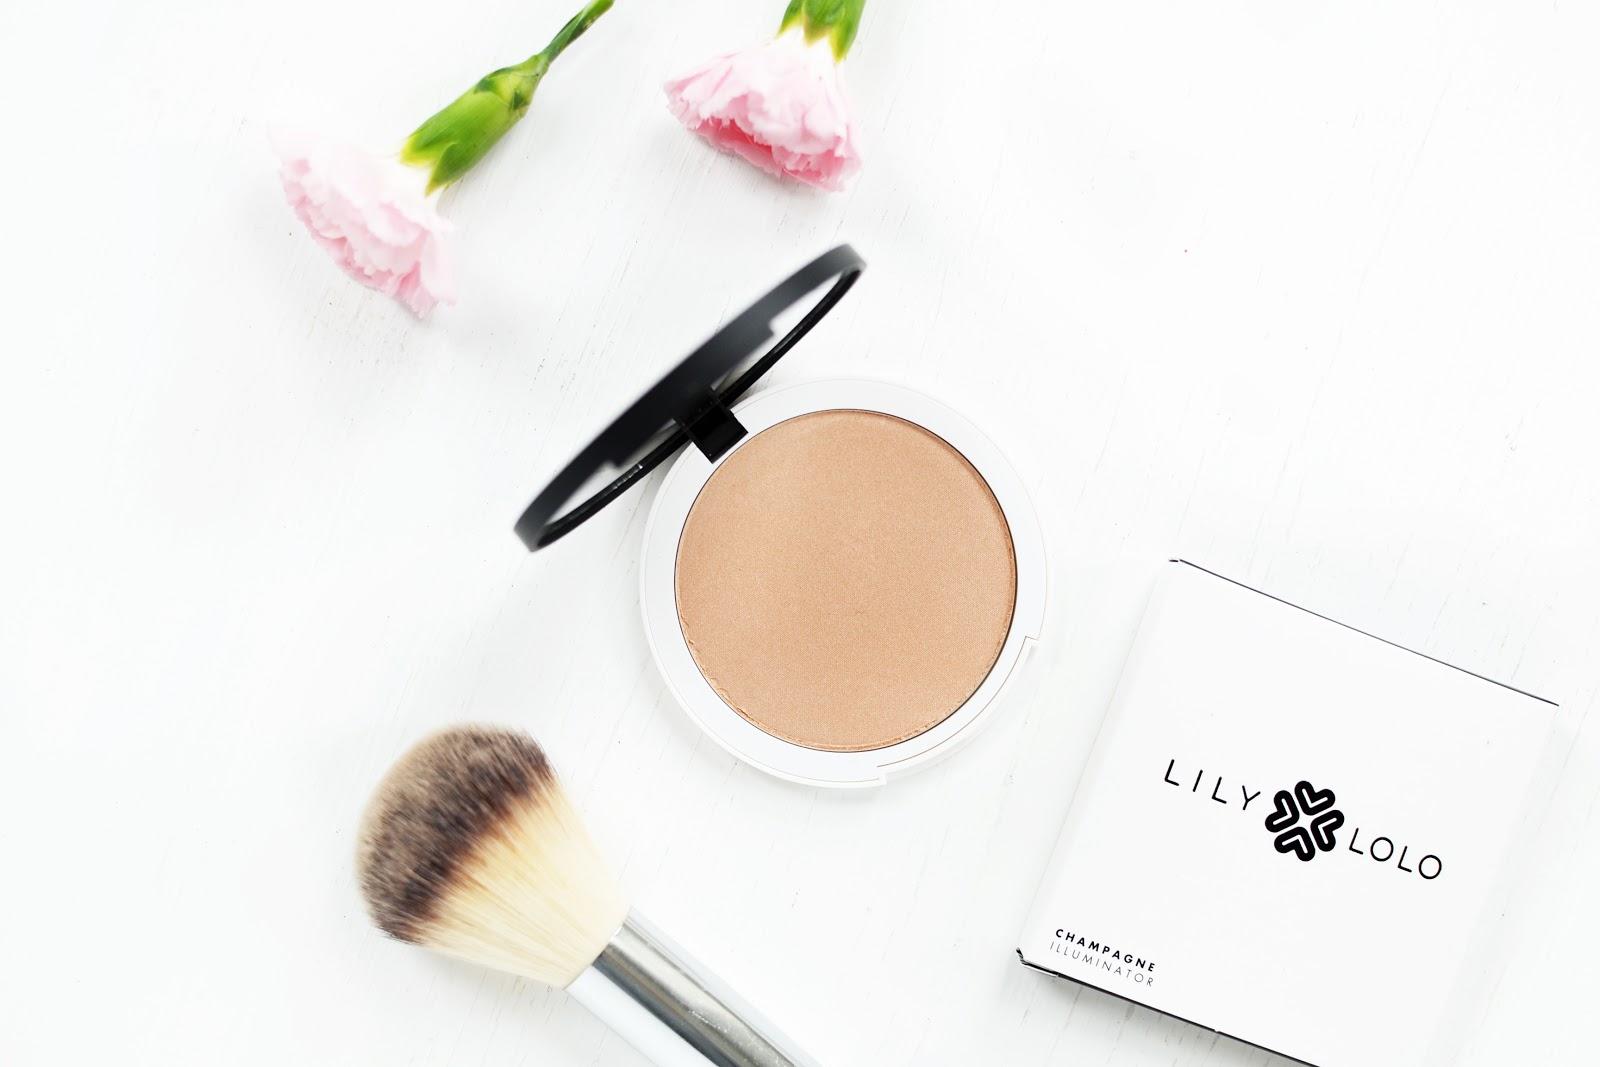 lily lolo pressed illuminator highlighter powder